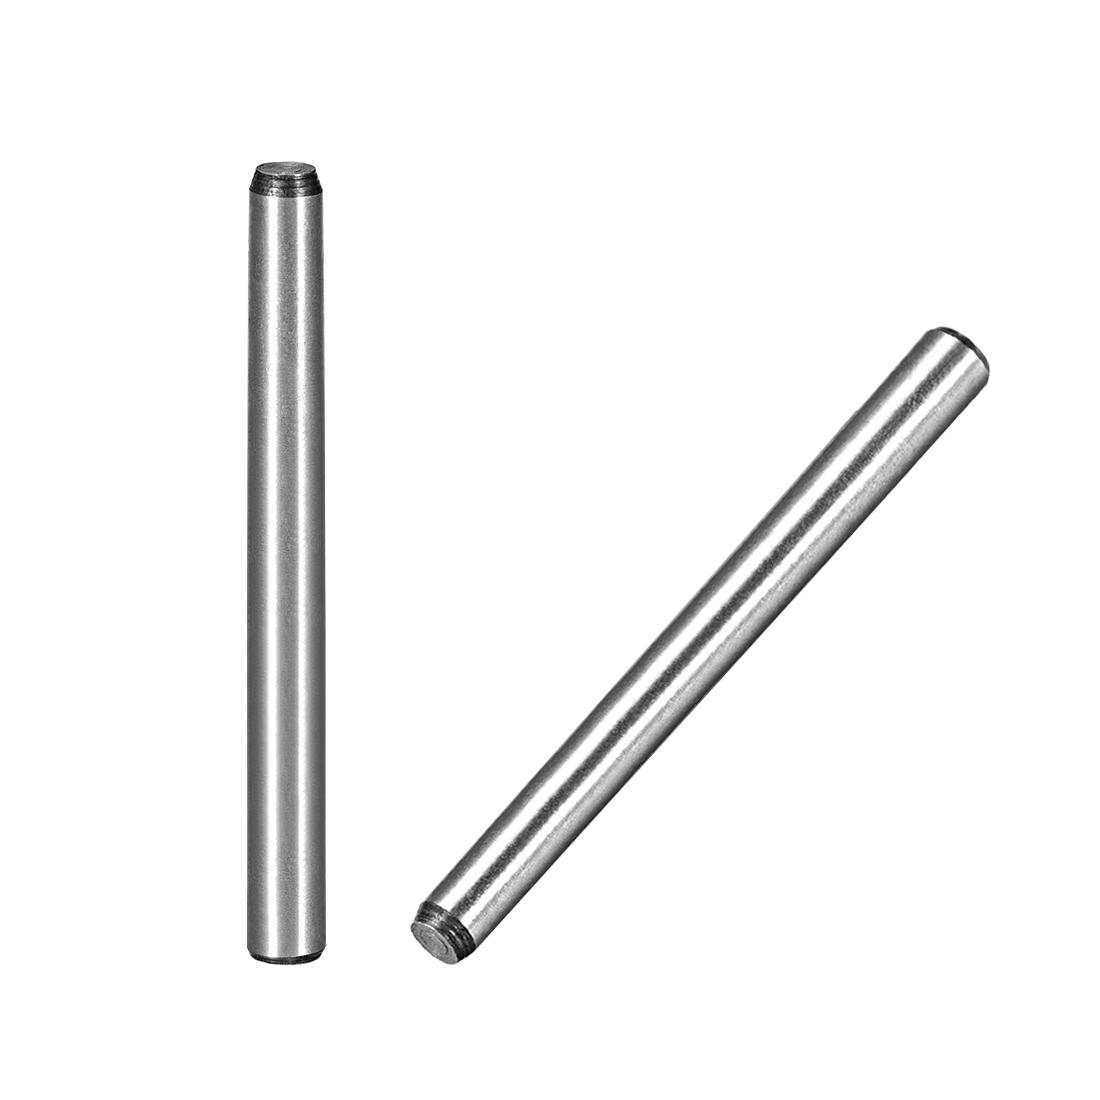 45# Carbon Steel GB117 80mm Length 6mm Small End Diameter 1:50 Taper Pin 5Pcs